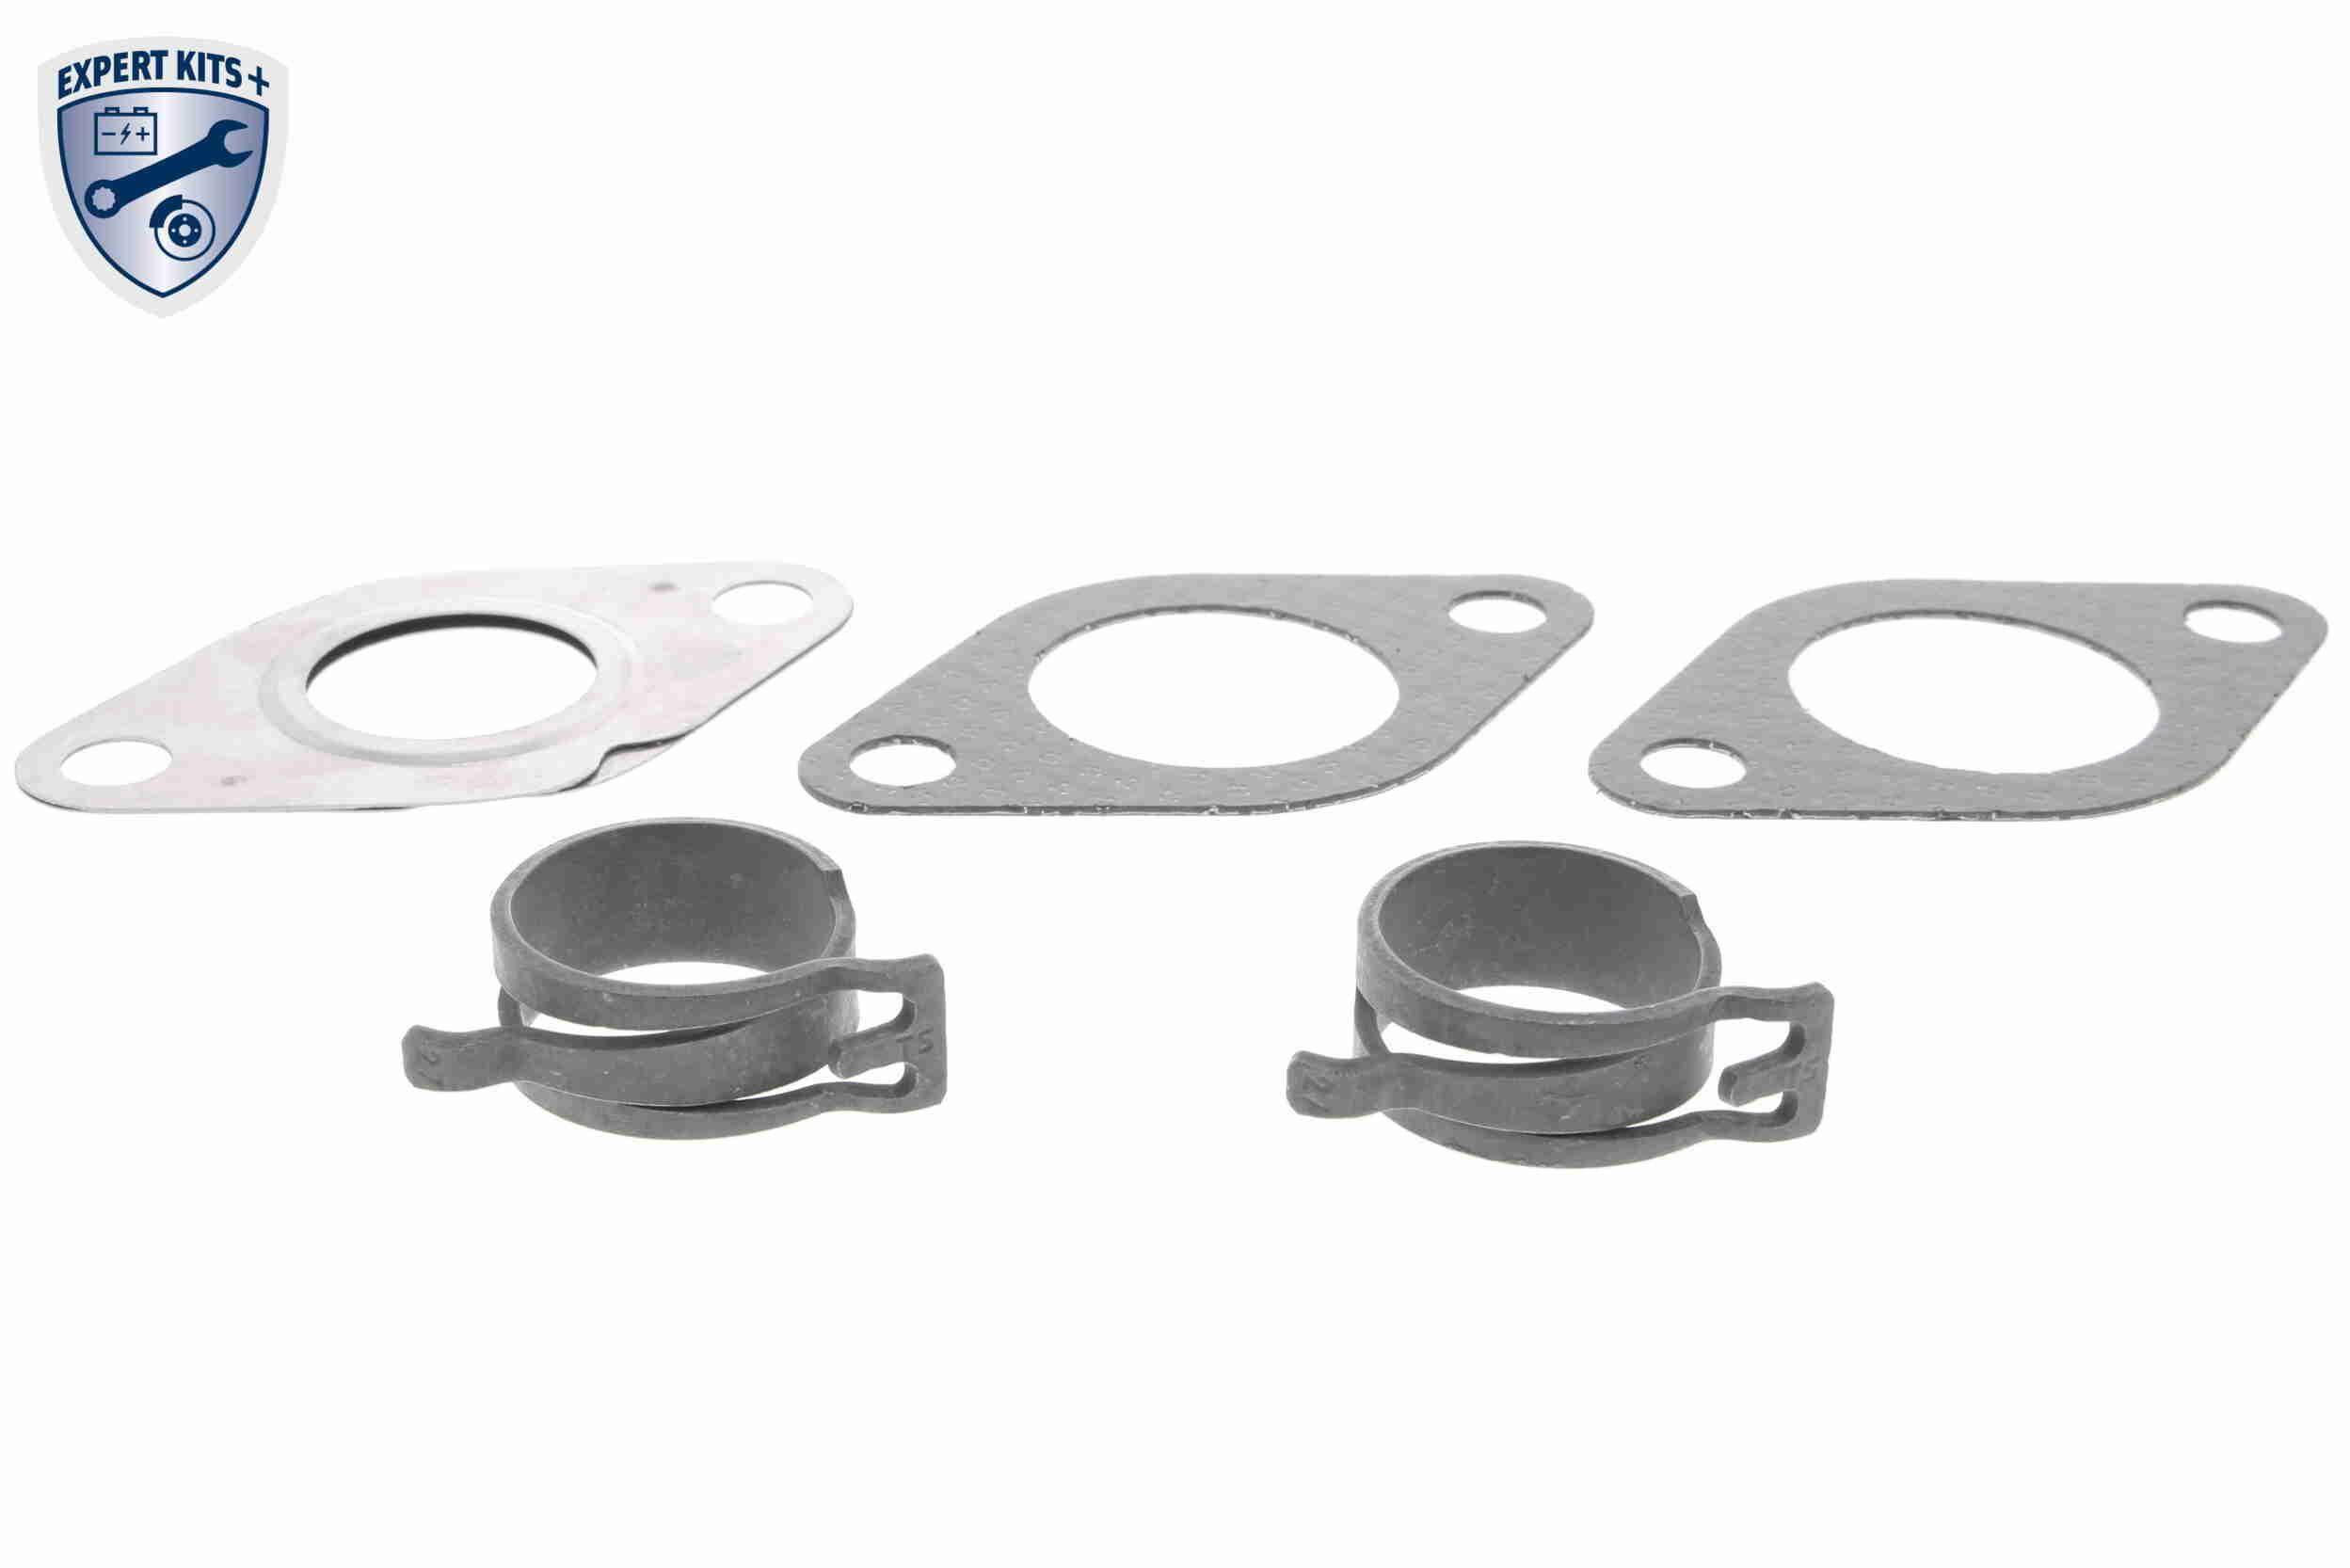 V10-63-9127 VEMO Dichtungssatz, AGR-System V10-63-9127 günstig kaufen